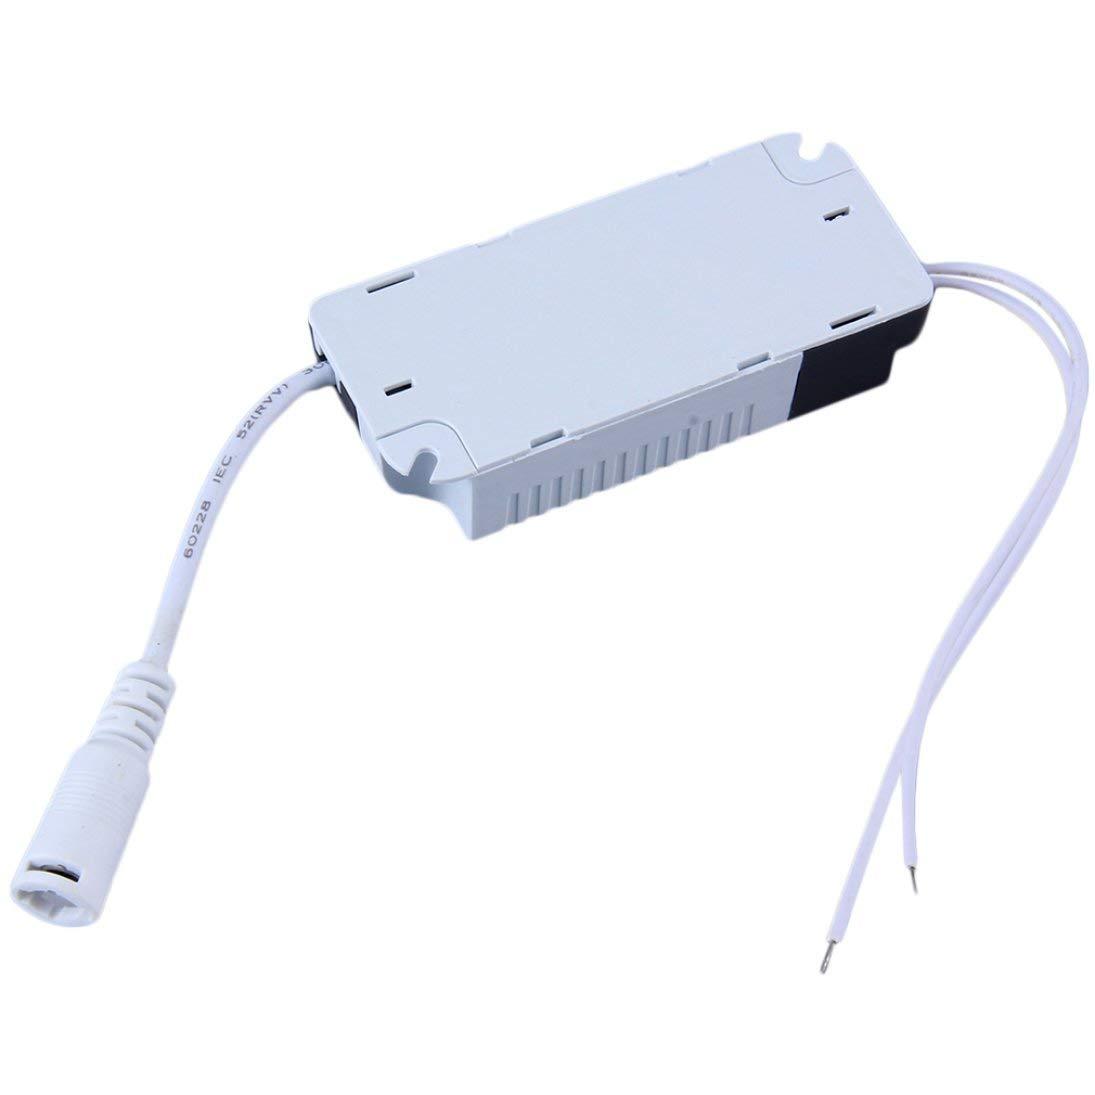 WEIHAN Alimentatore per trasformatore Driver Lampada dimmerabile a LED dimmerabile 6//9//12//15//18 21W Assicura Driver connettore Esterno CC Alimentatore a Luce di Striscia